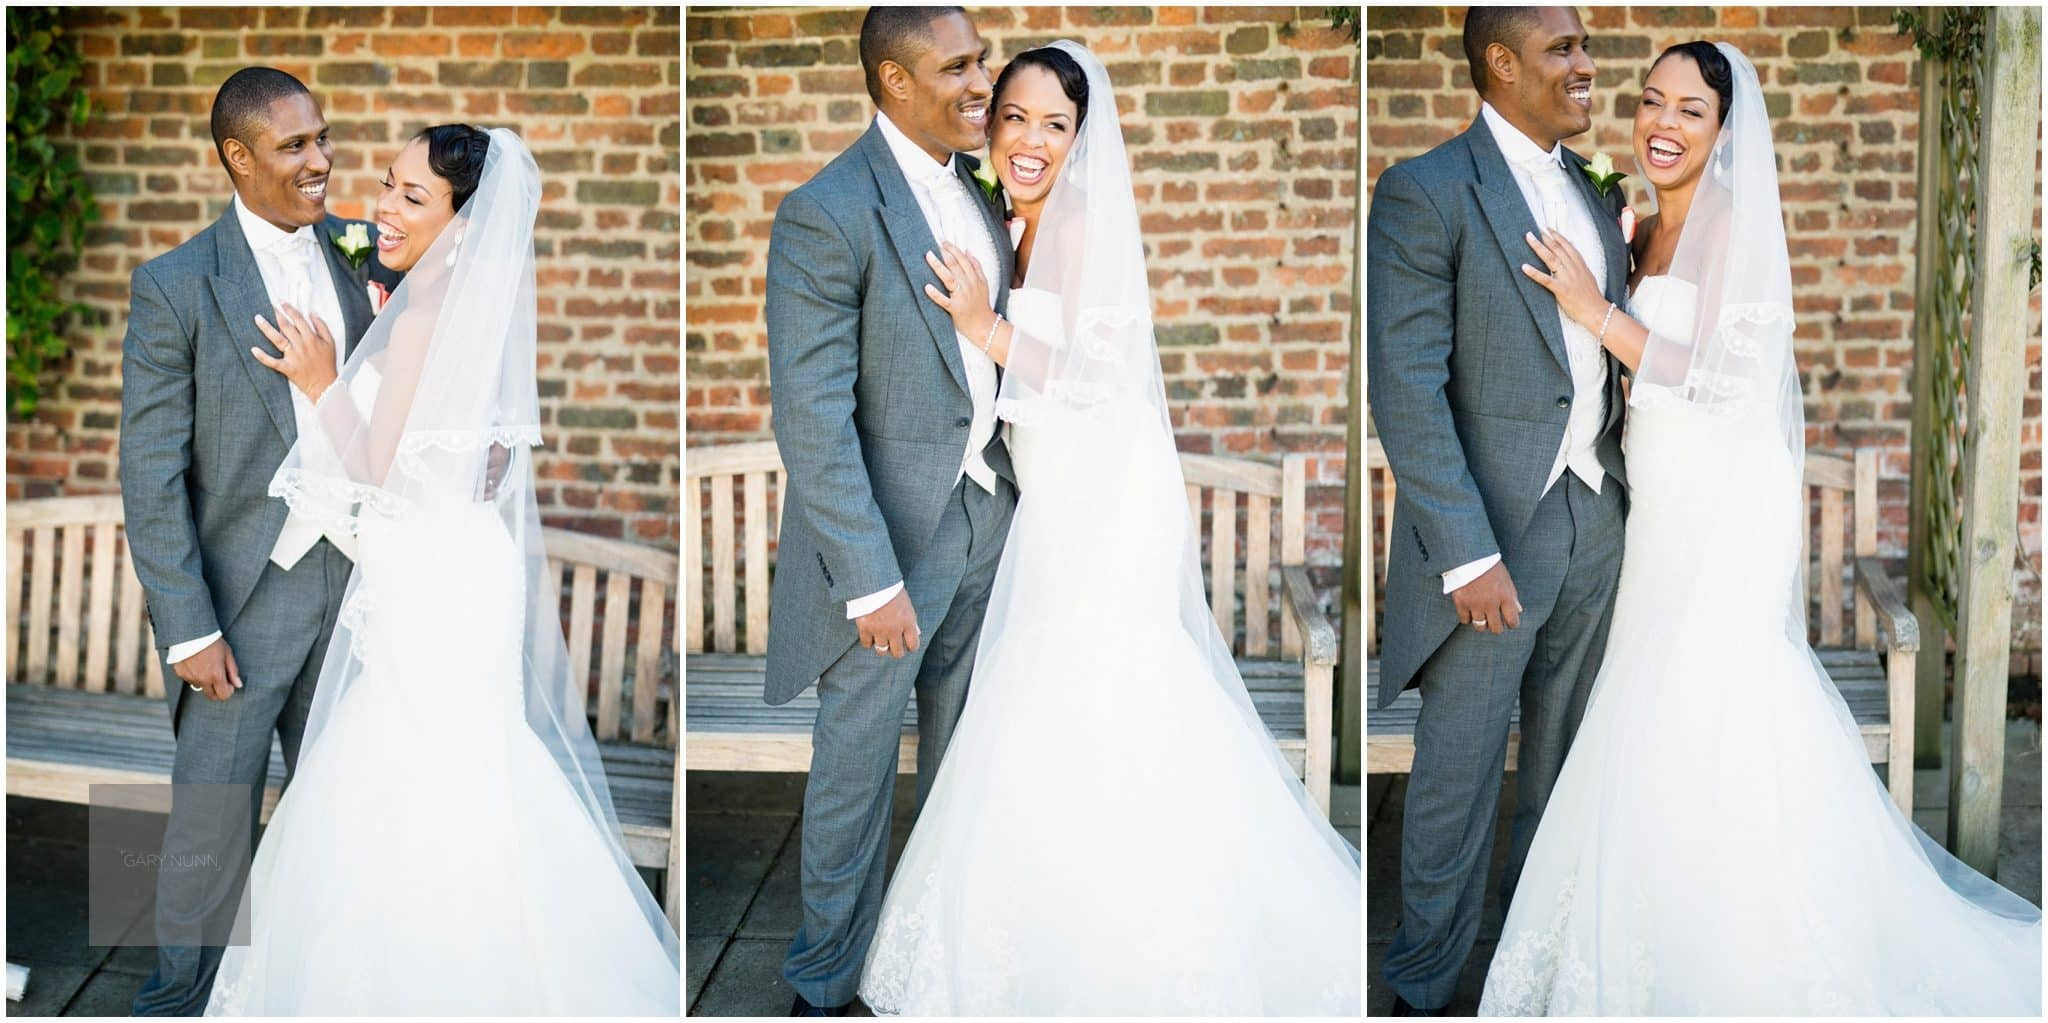 Wedding Photography Milton Keynes, Woburn Sculpture Gallery Weddings